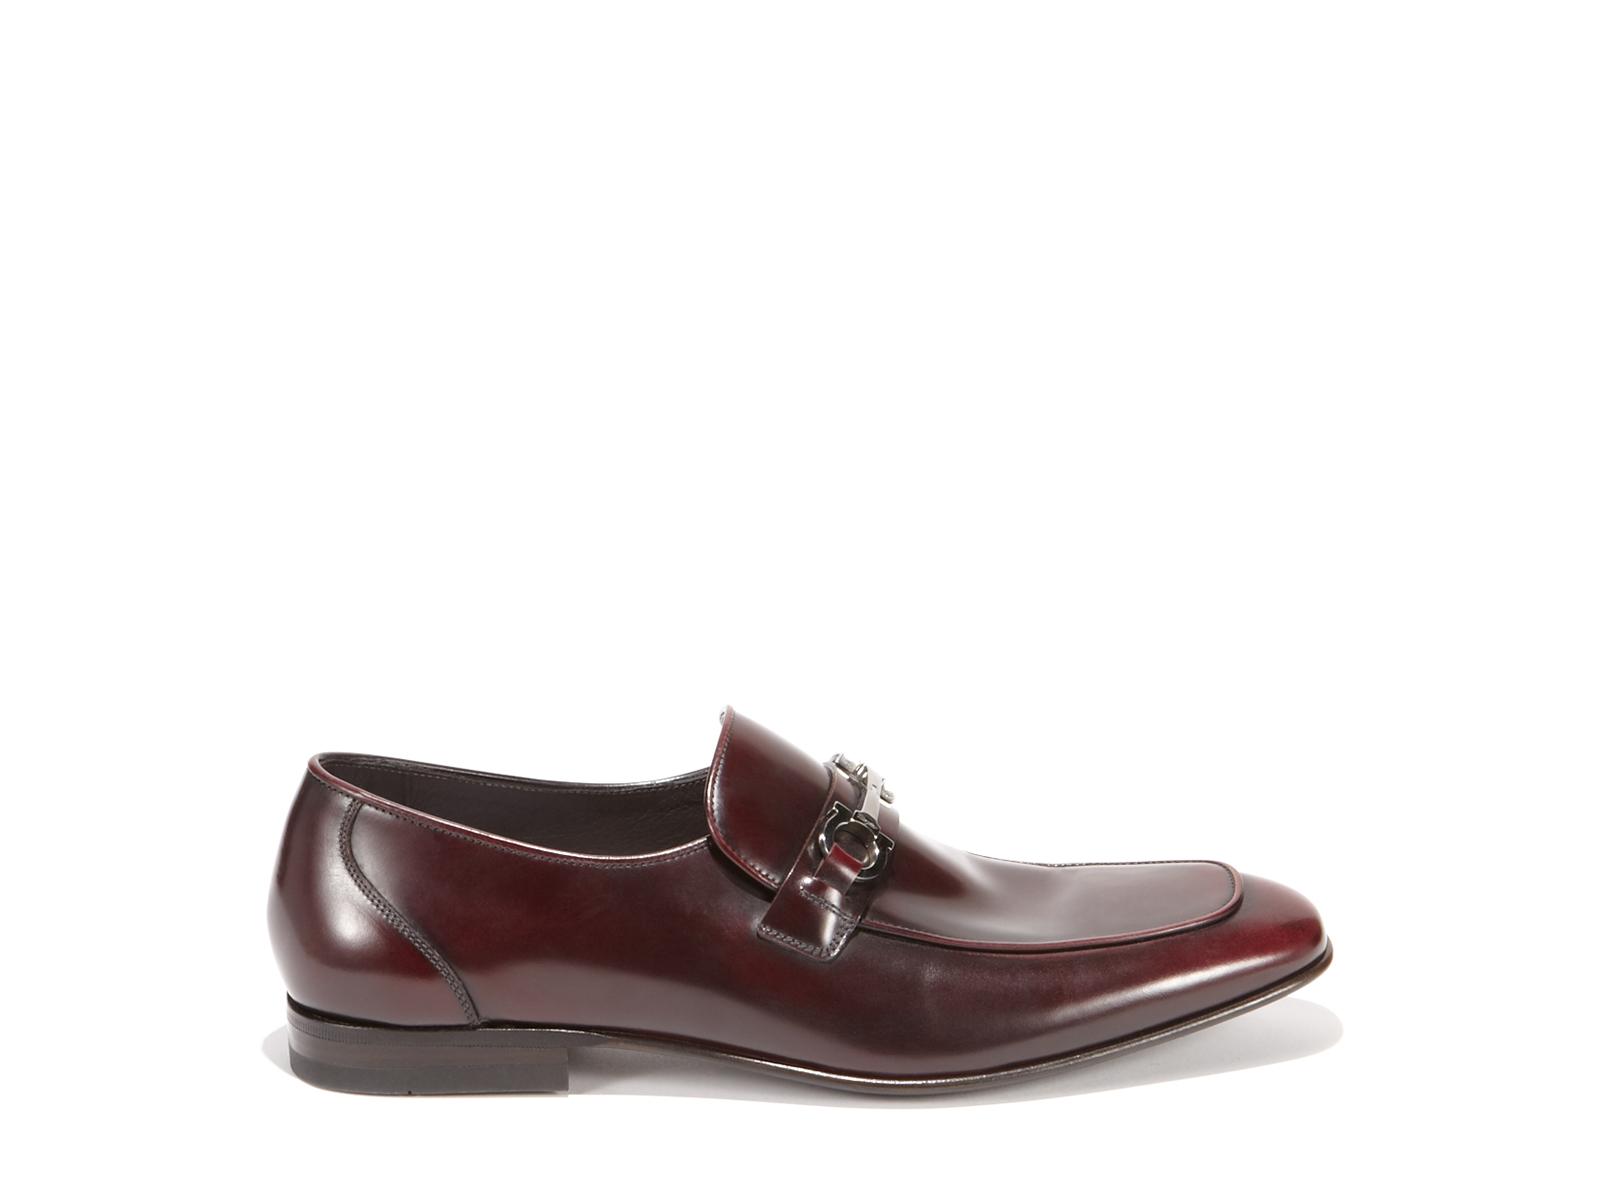 Lyst Ferragamo Gancio Bit Loafer In Brown For Men